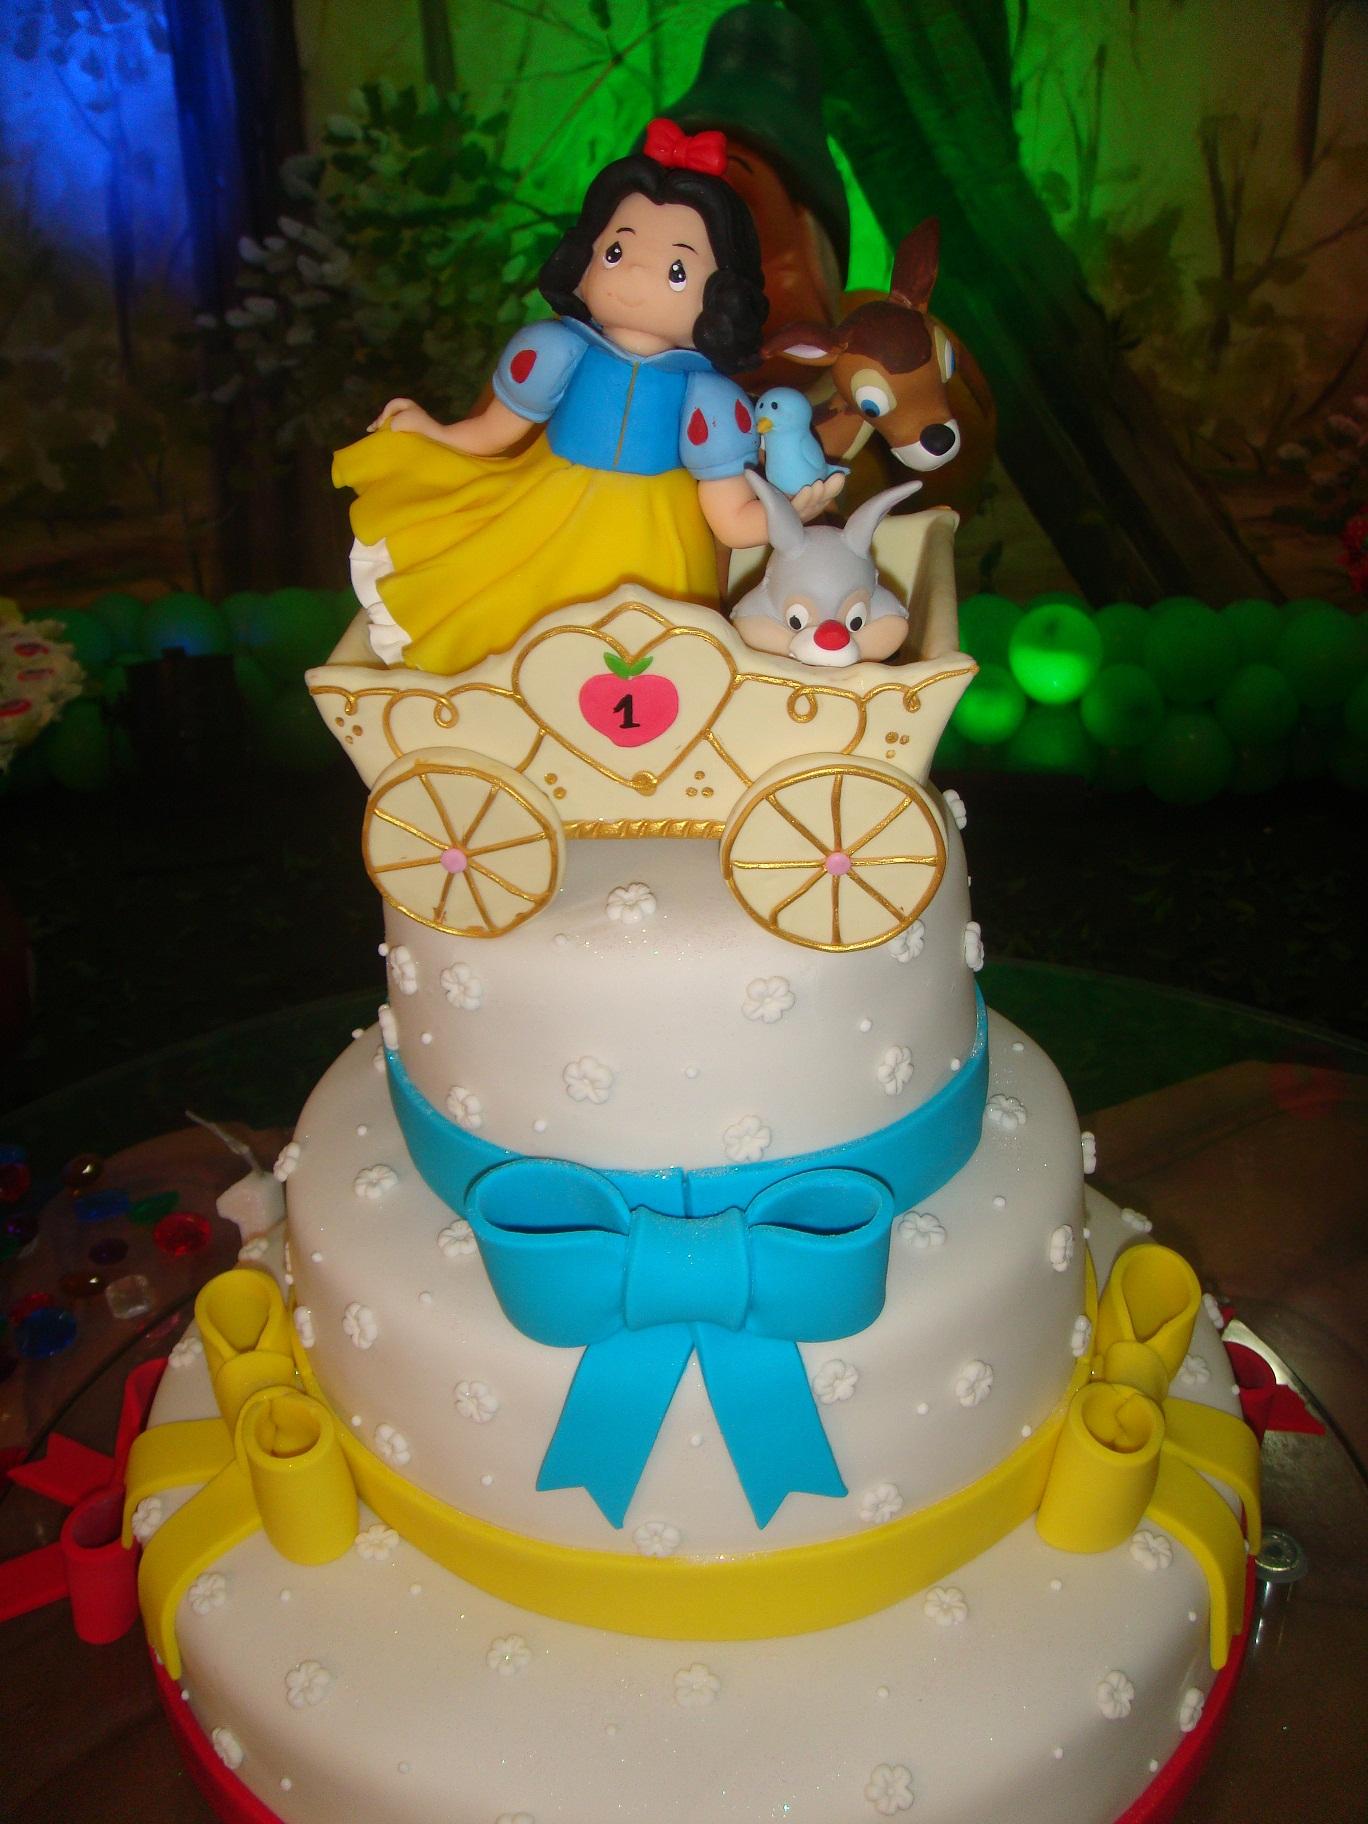 decoracao de aniversario tema branca de neve:Tema de festa: Branca de Neve